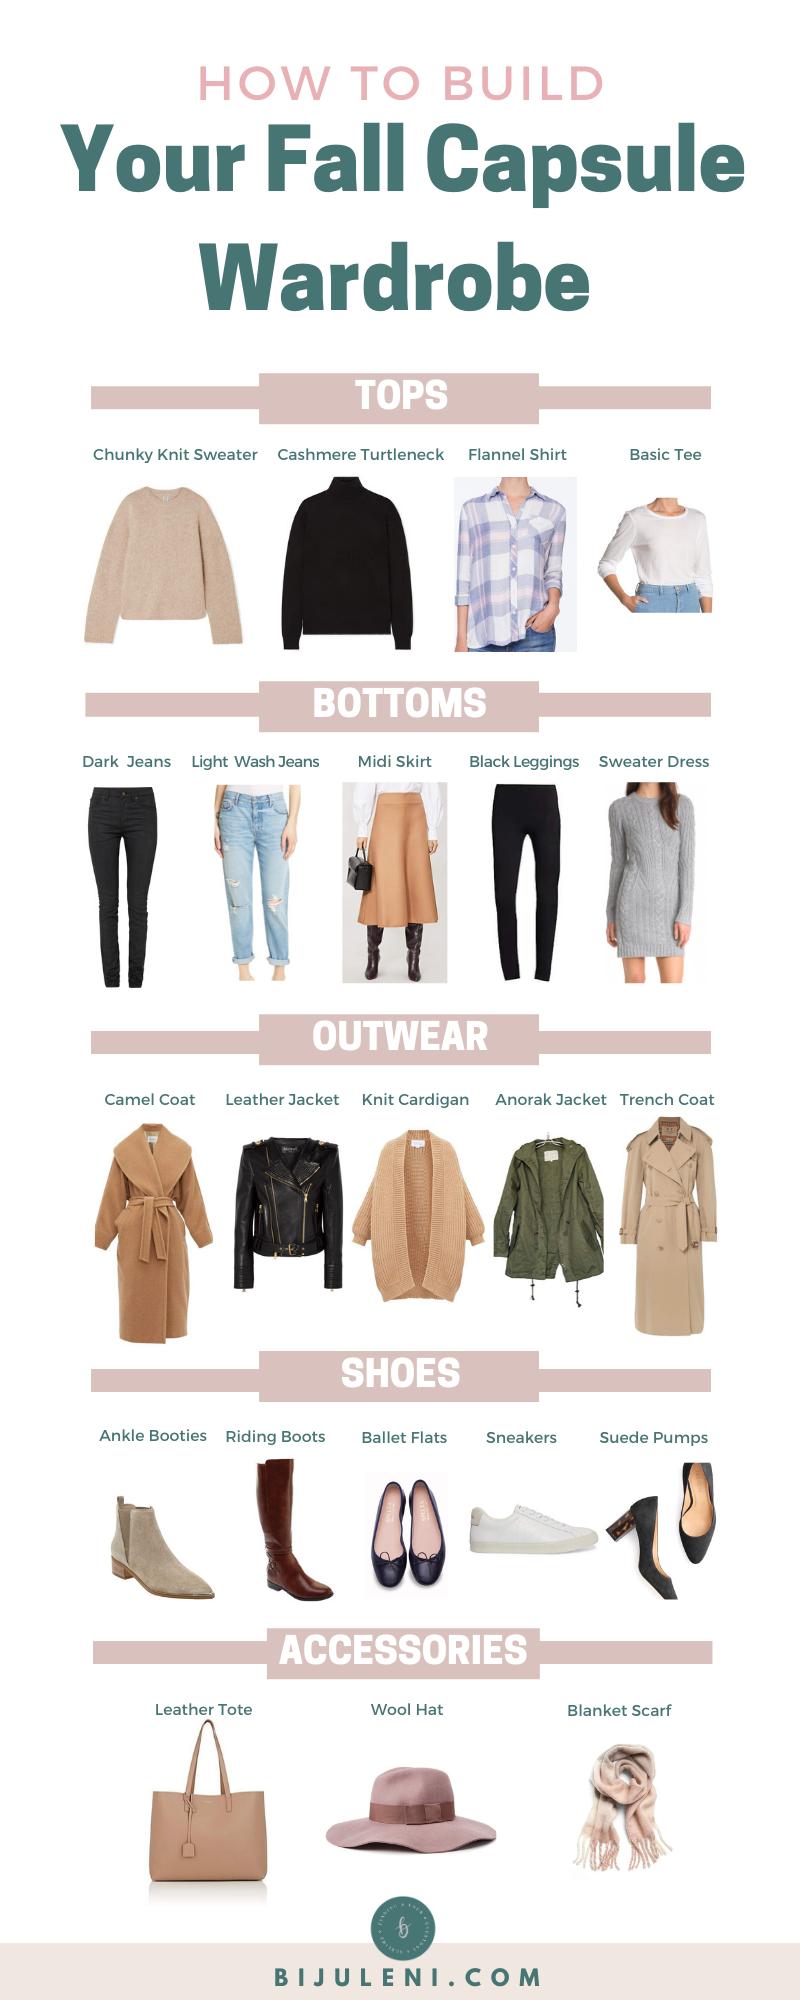 Fall Capsule Wardrobe Item List